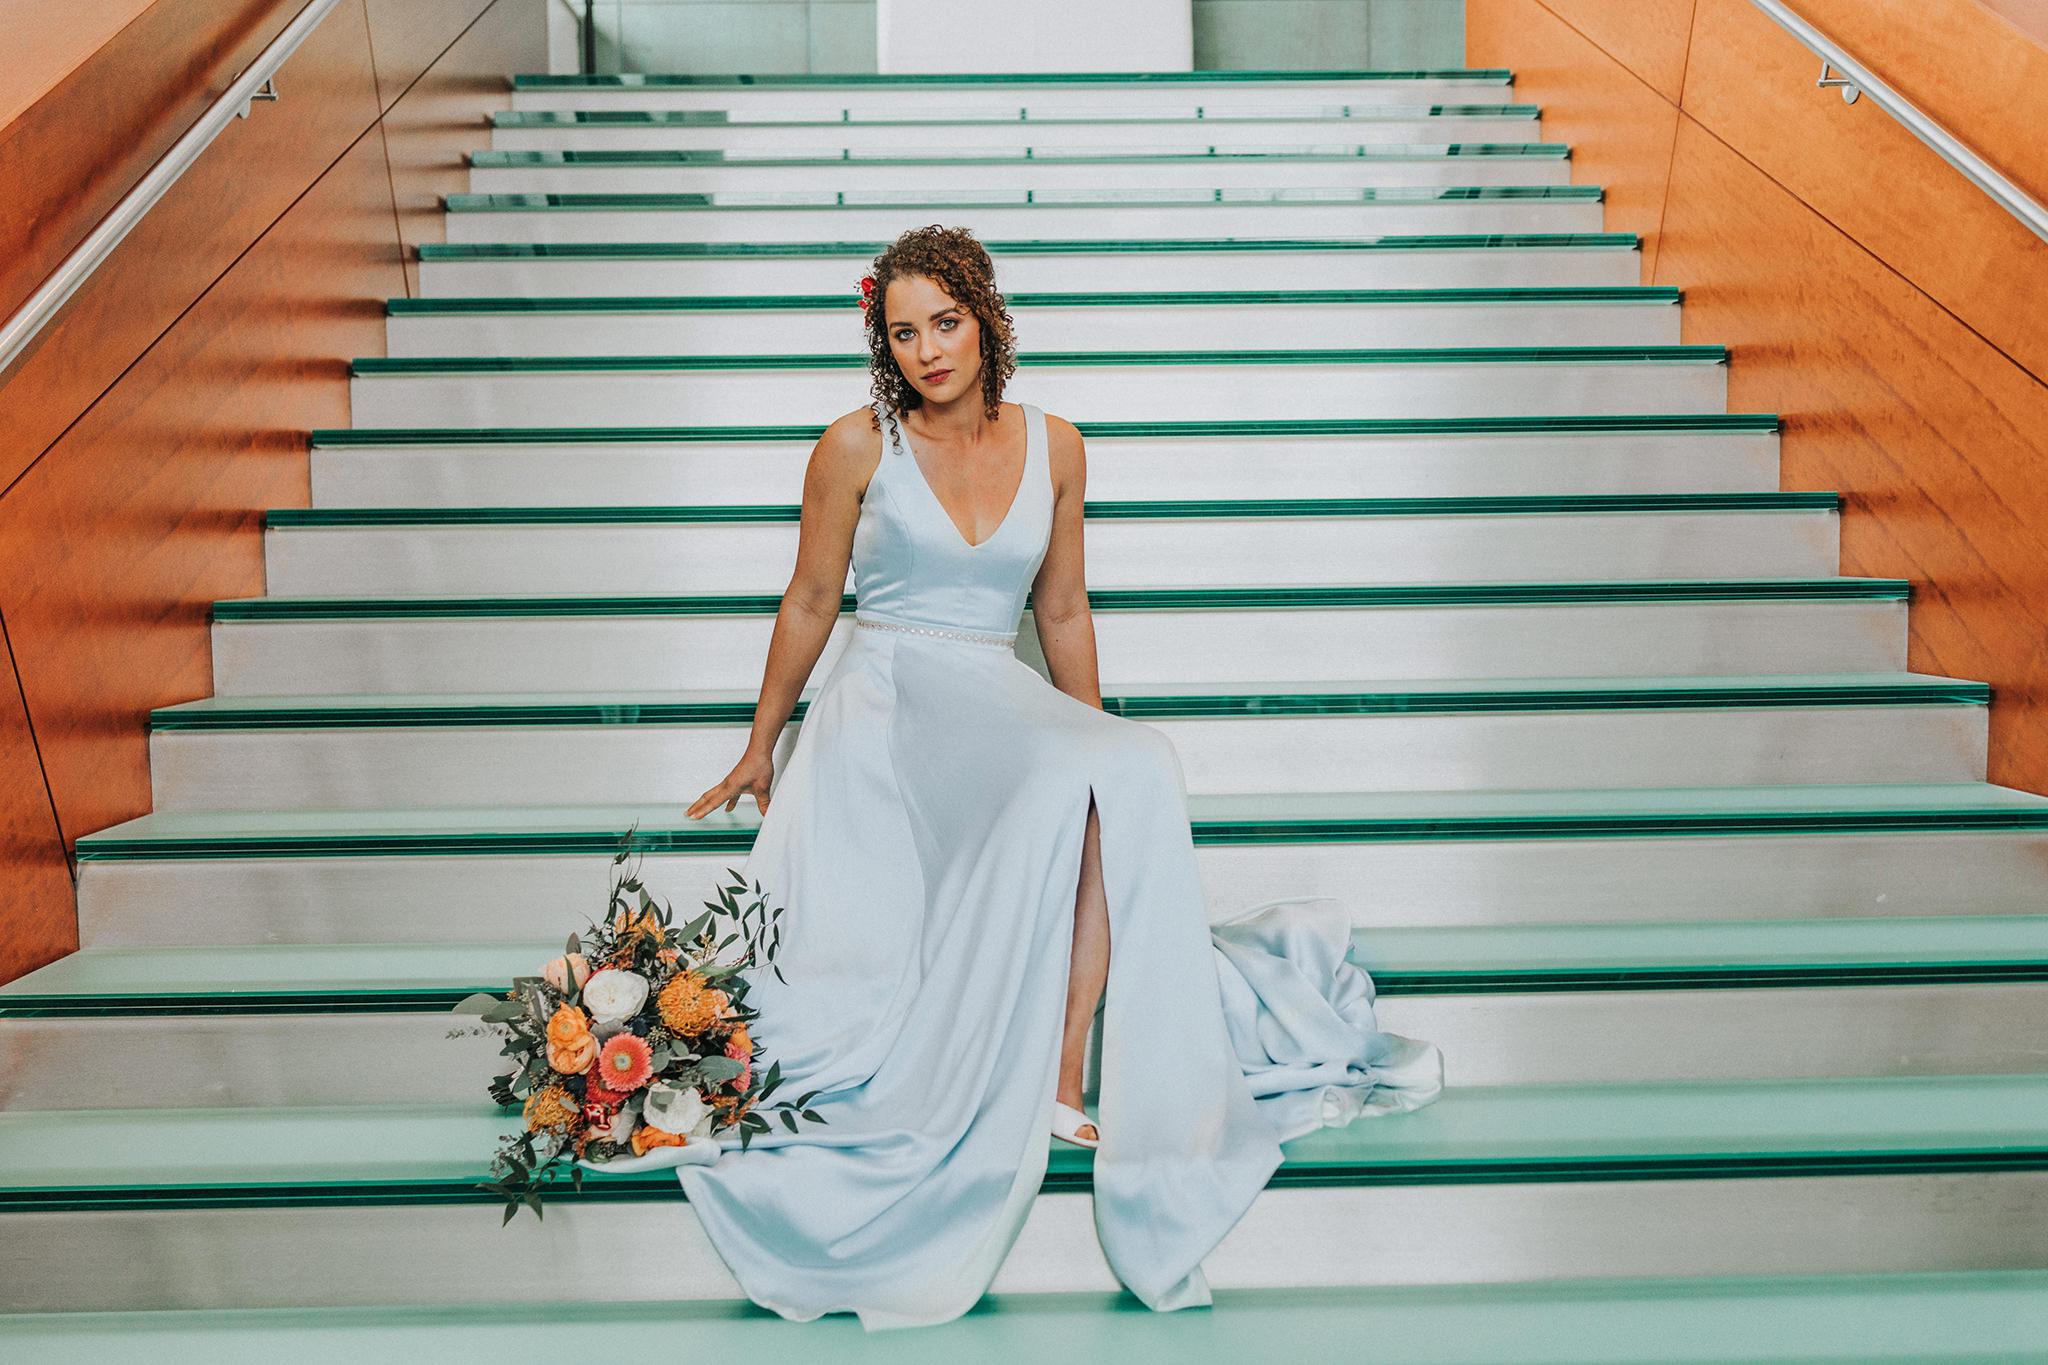 180 omaha-wedding-photographer-planner-tiny-luxe-velvet-sage.jpg